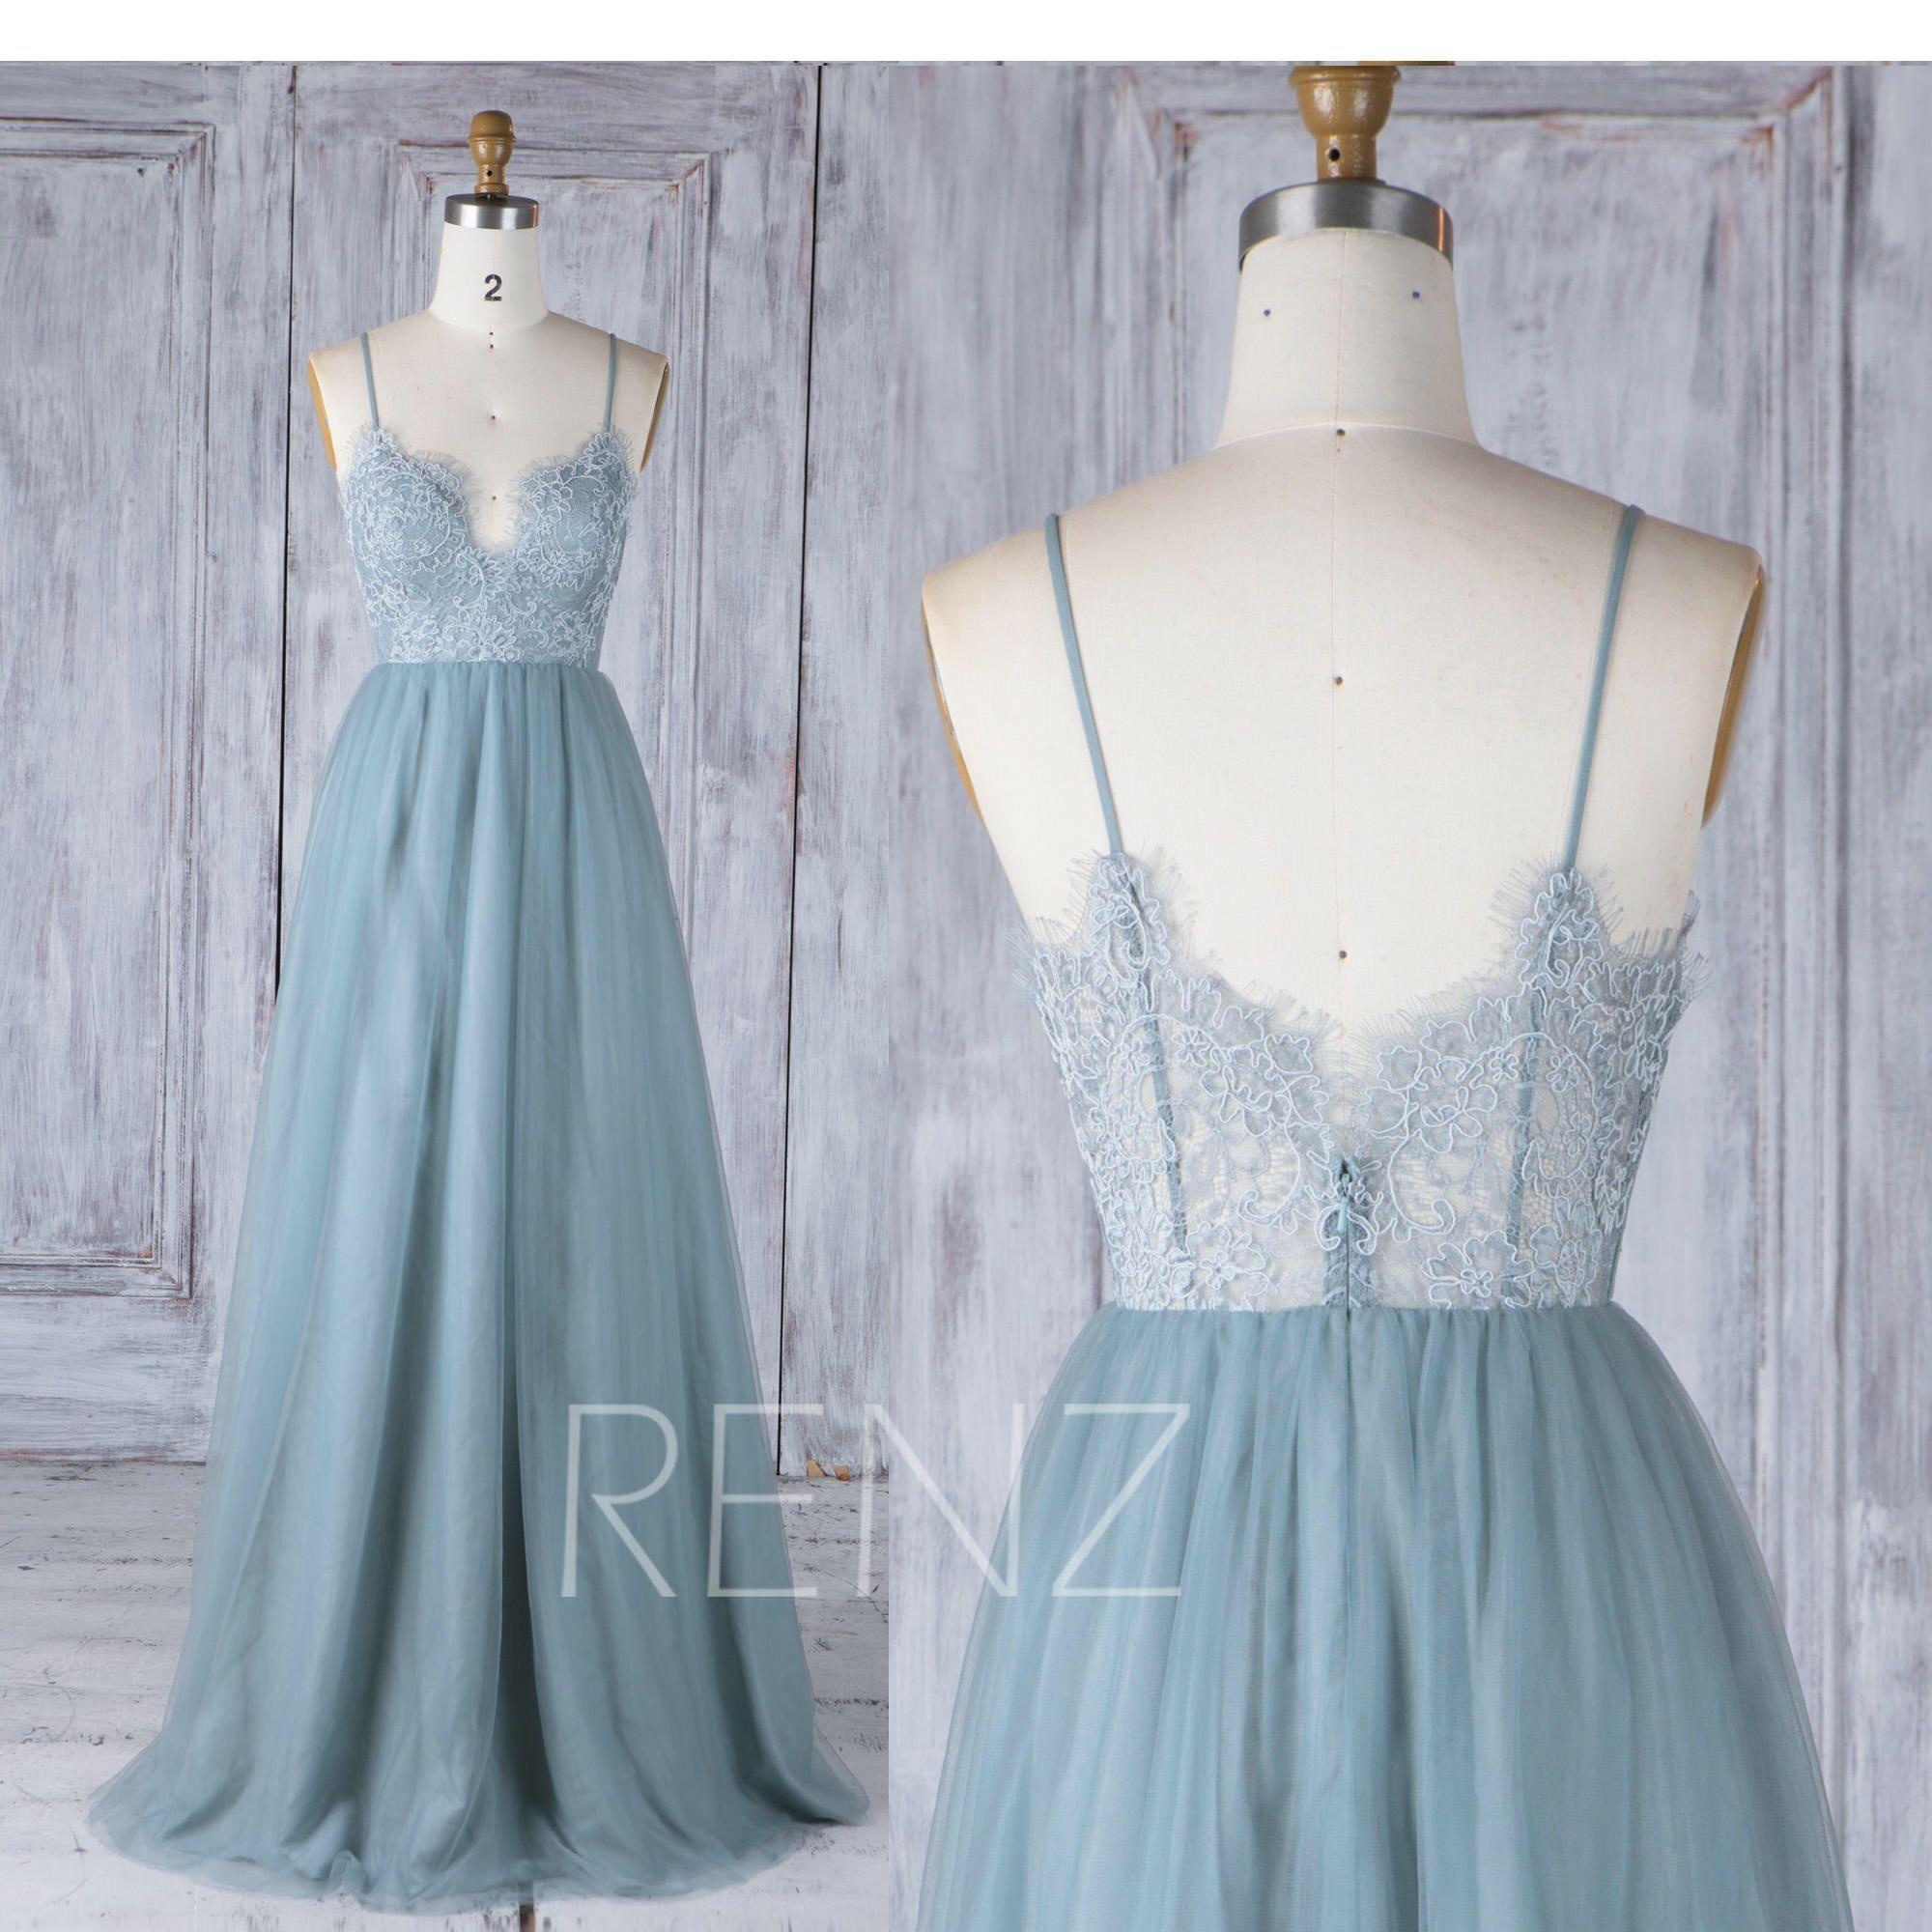 Green Emerald chiffon bridesmaid dresses pictures